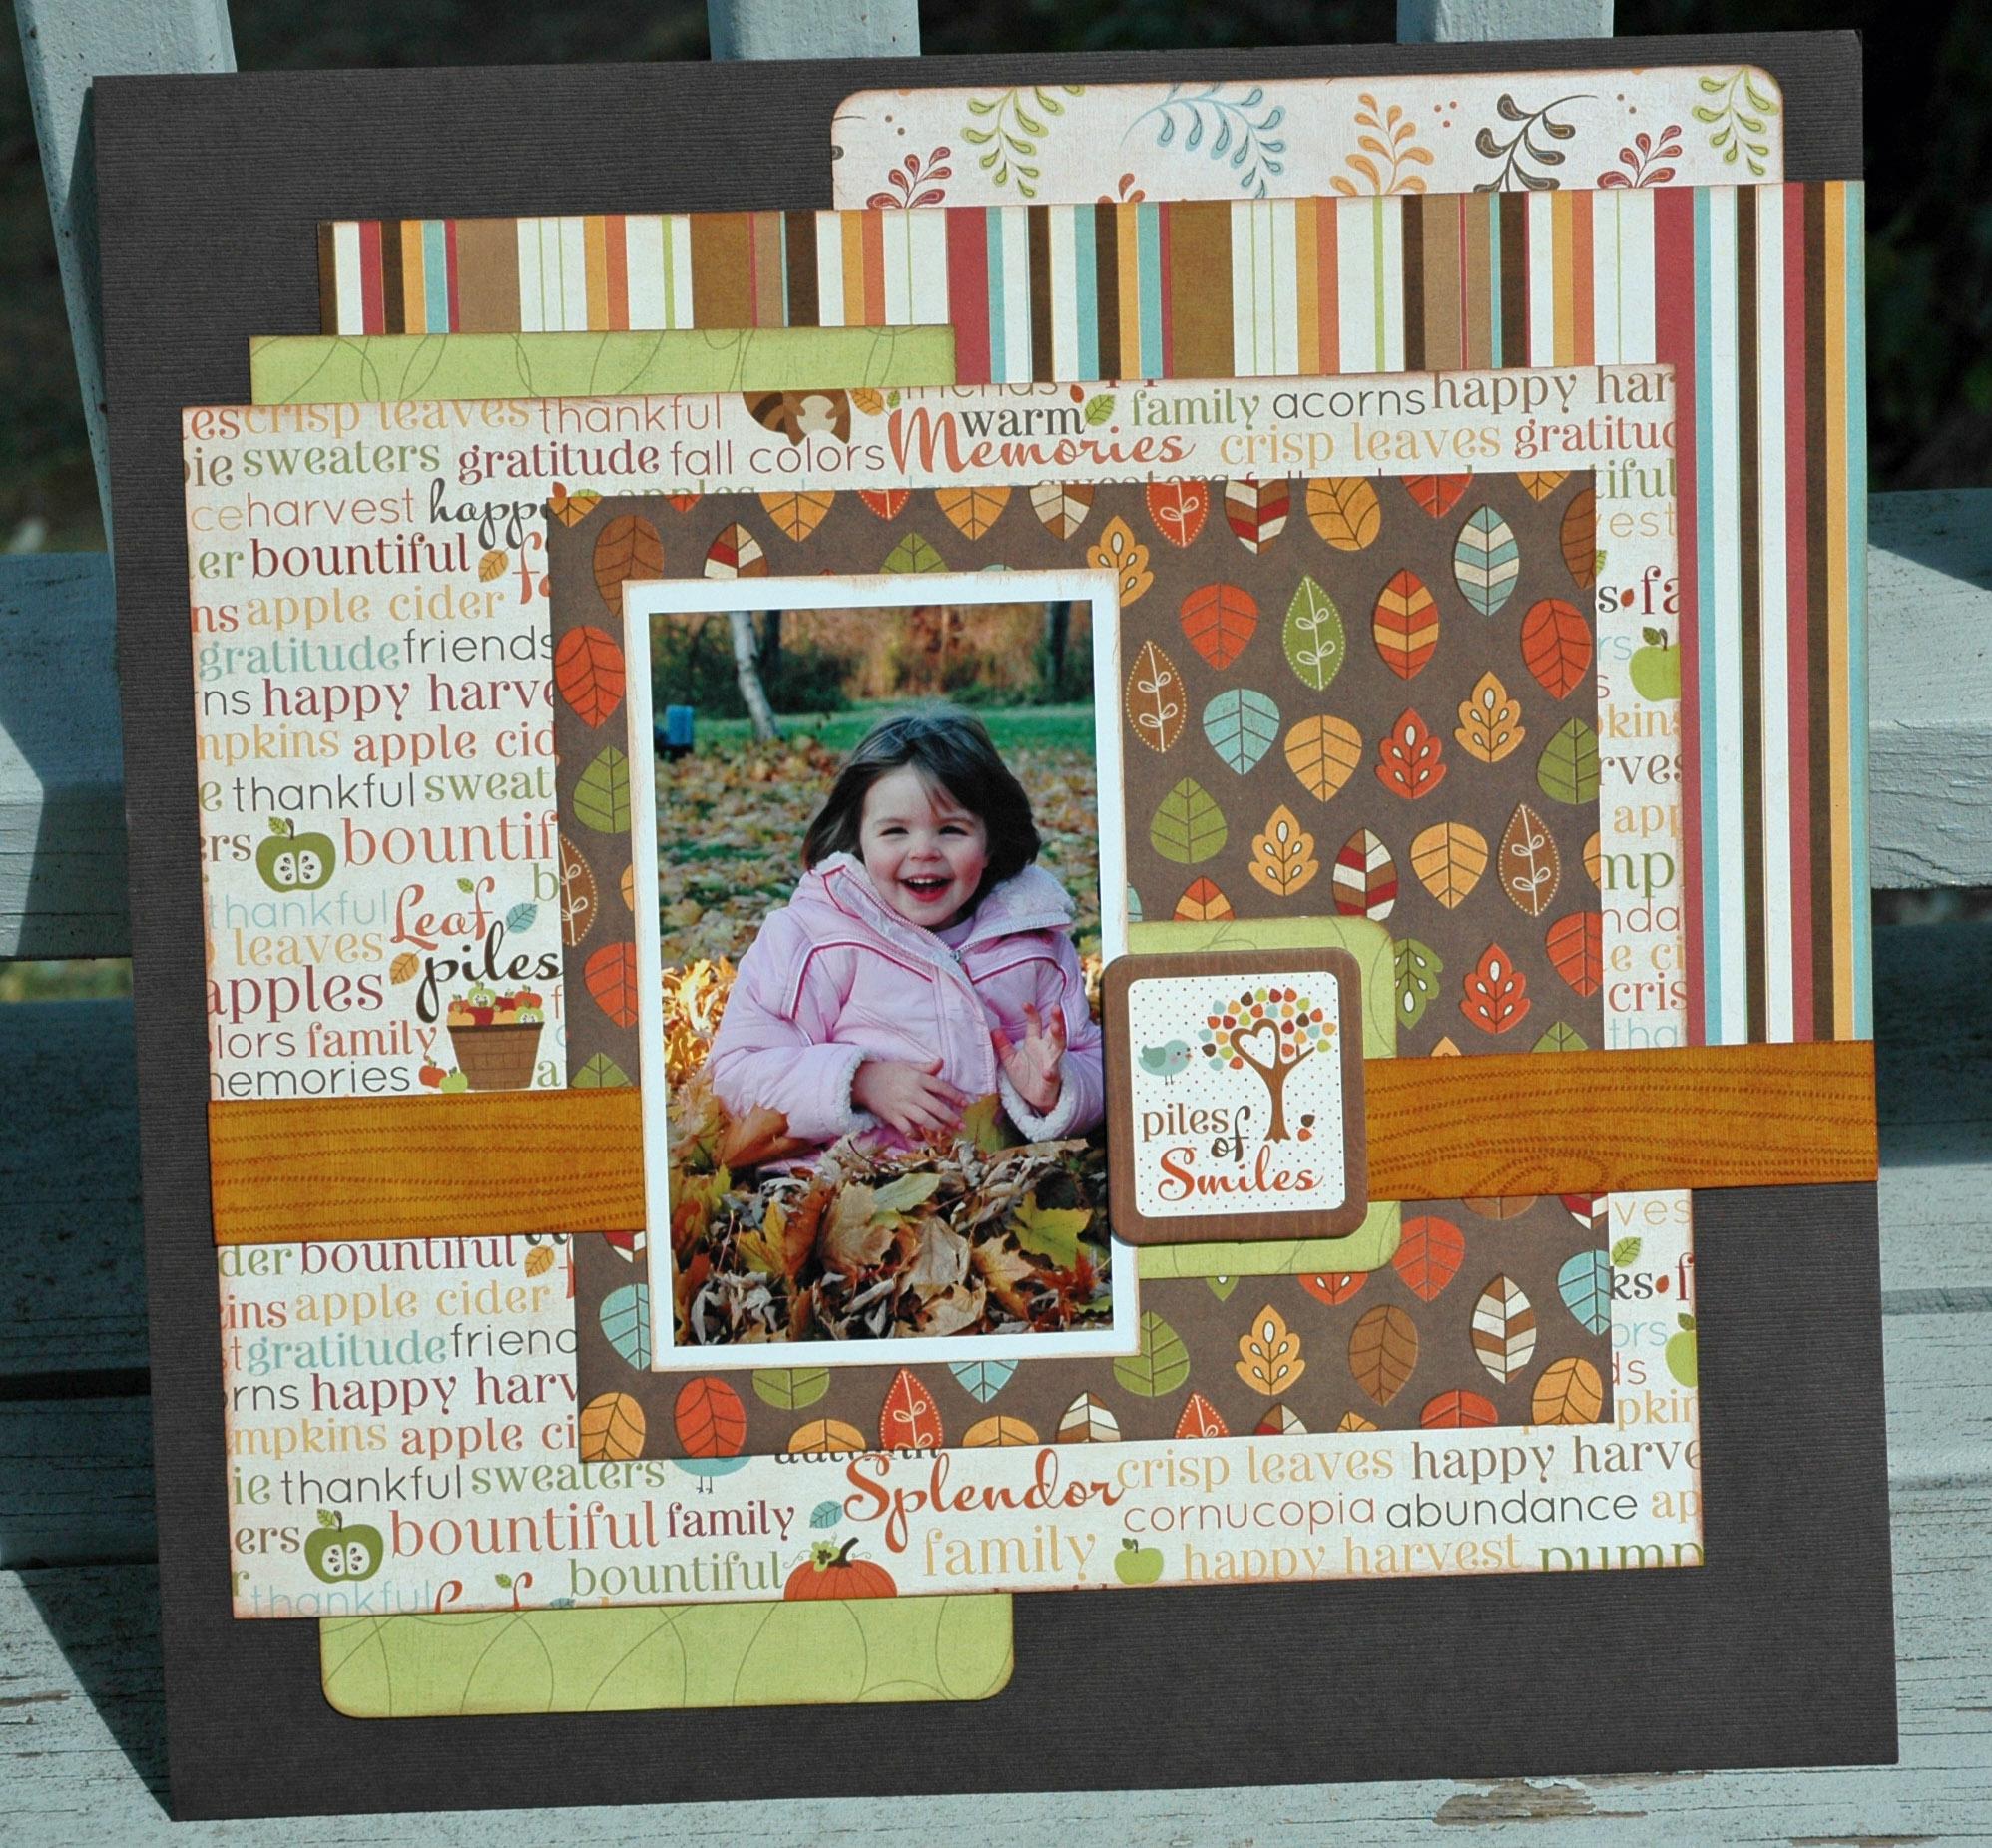 Scrapbook ideas about friends - Juliekapplecidersmiles